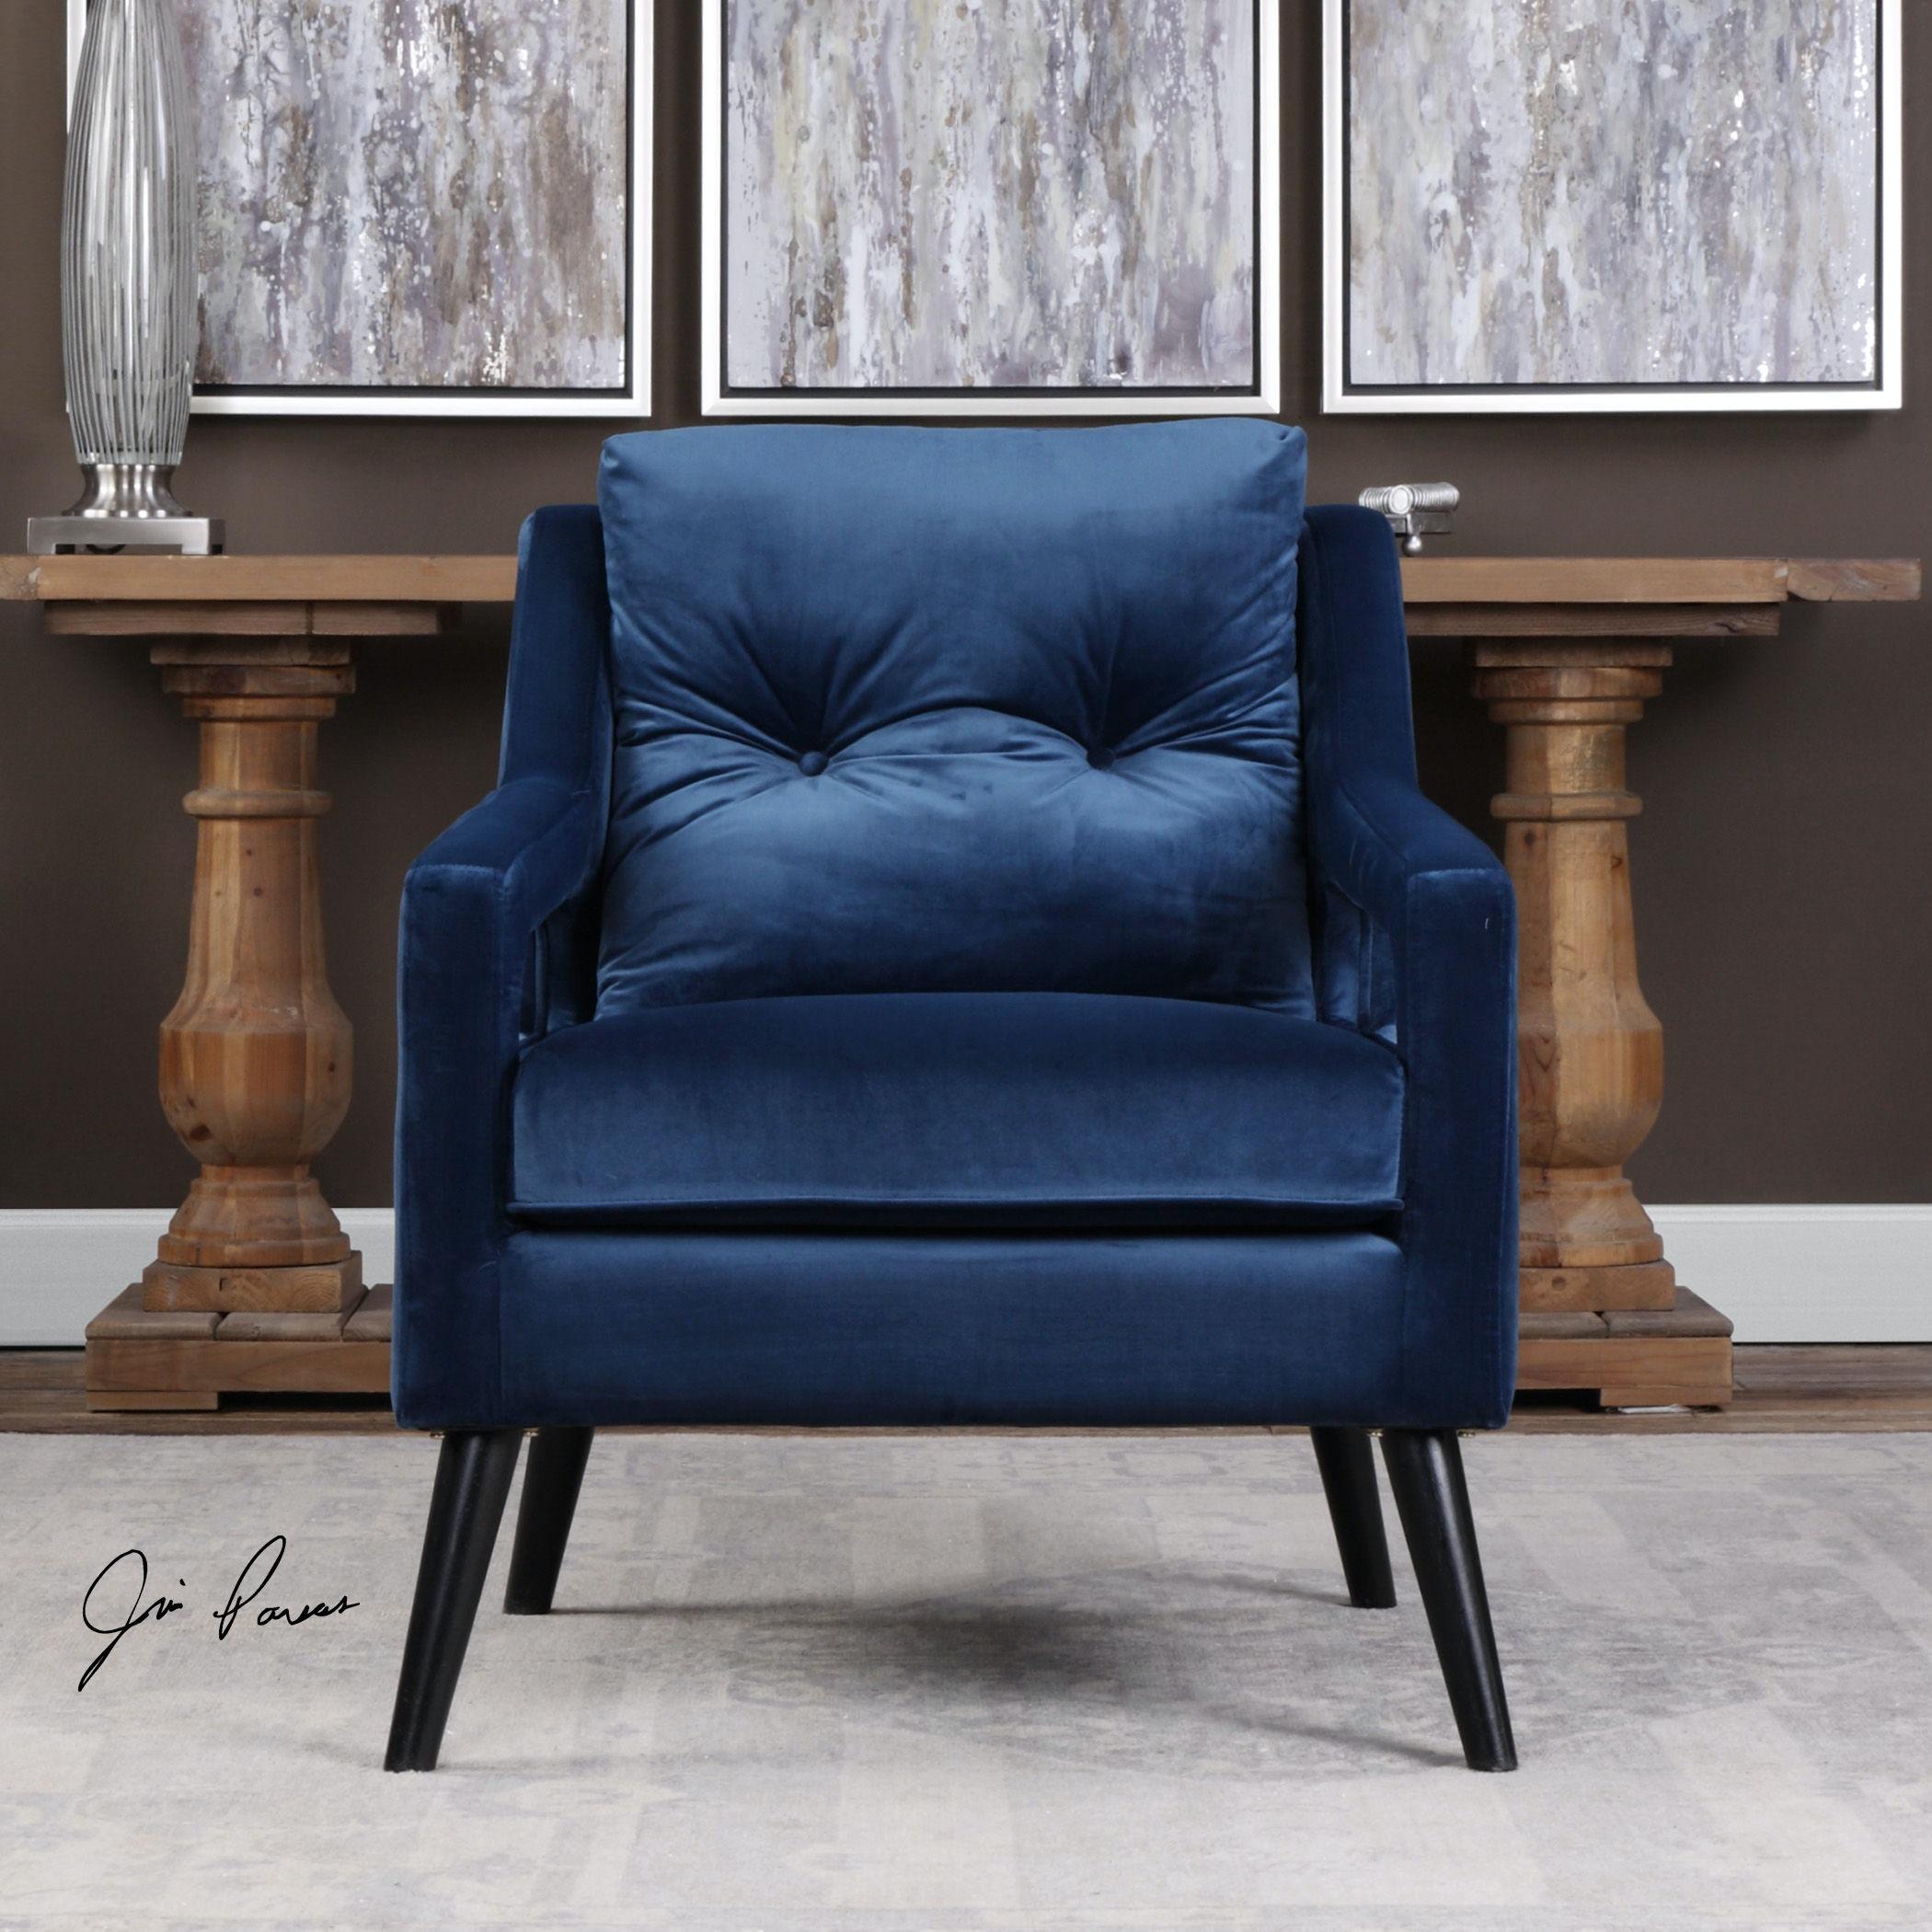 Uttermost Ou0027Brien Blue Velvet Armchair 23318